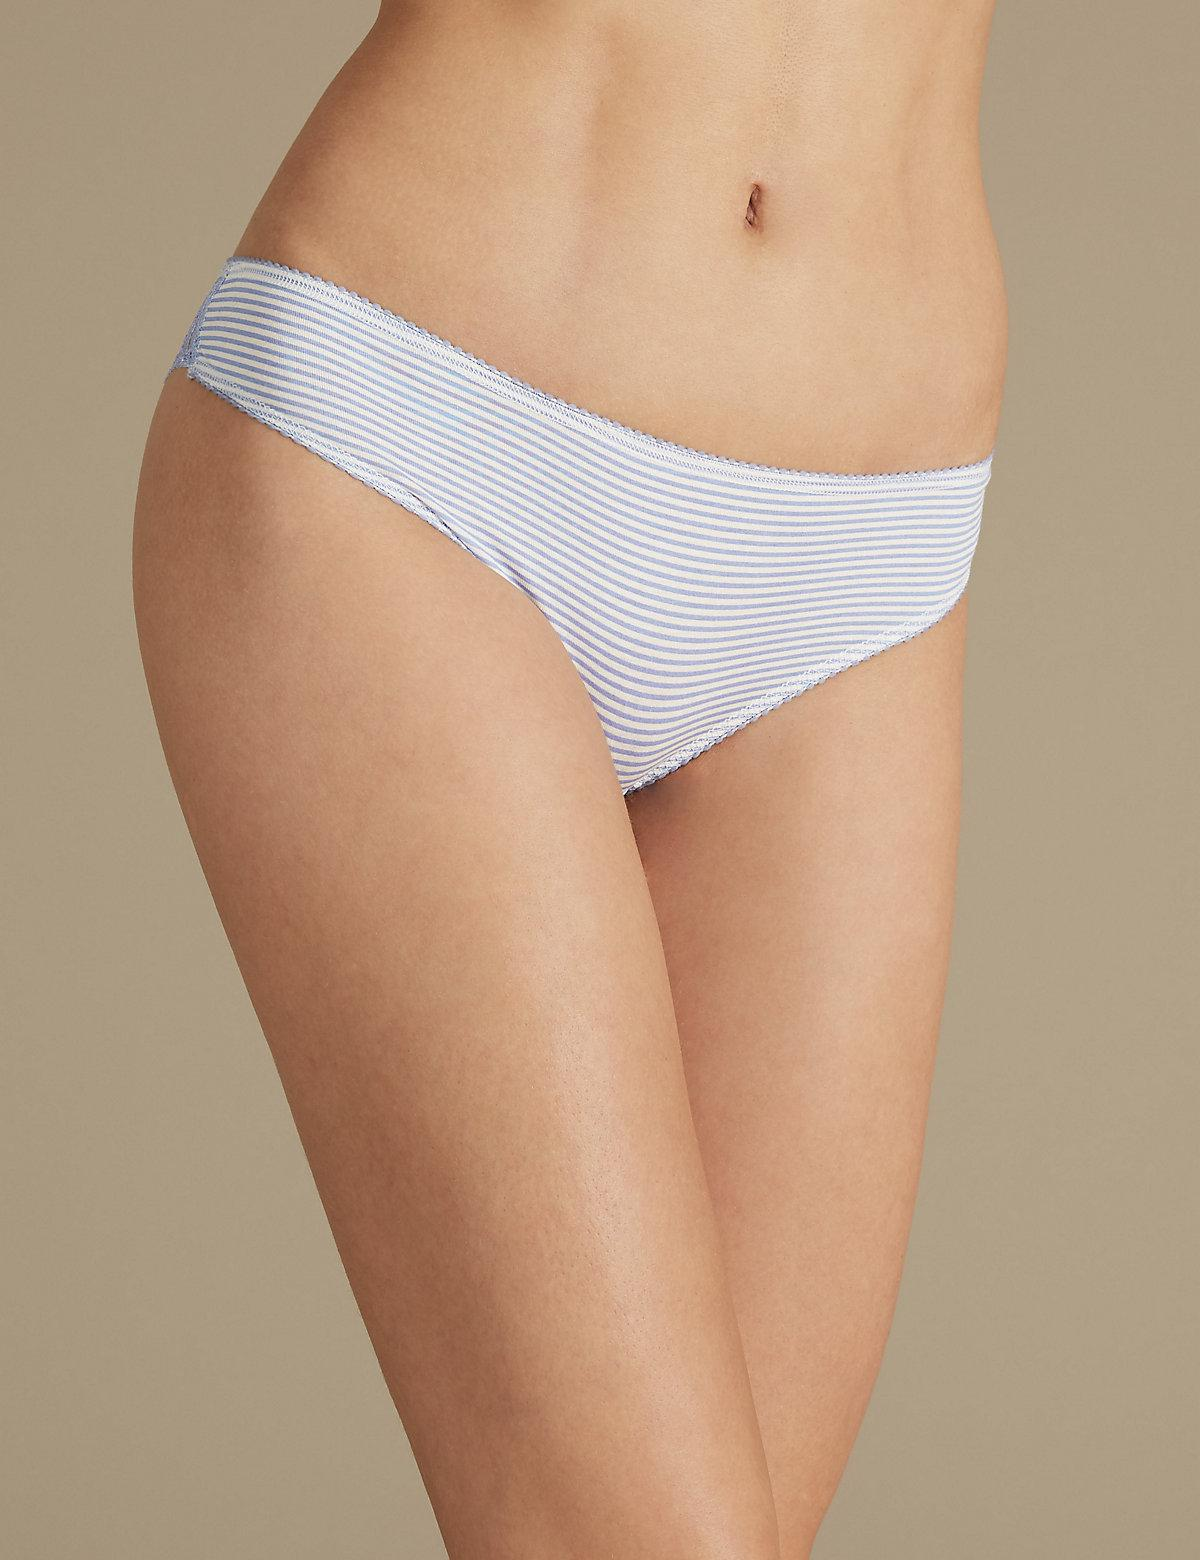 Marks & Spencer 5 Pack Cotton Rich Geometric Lace Brazillian Knickers - - 6 Cheap Discount NDzSJKcW